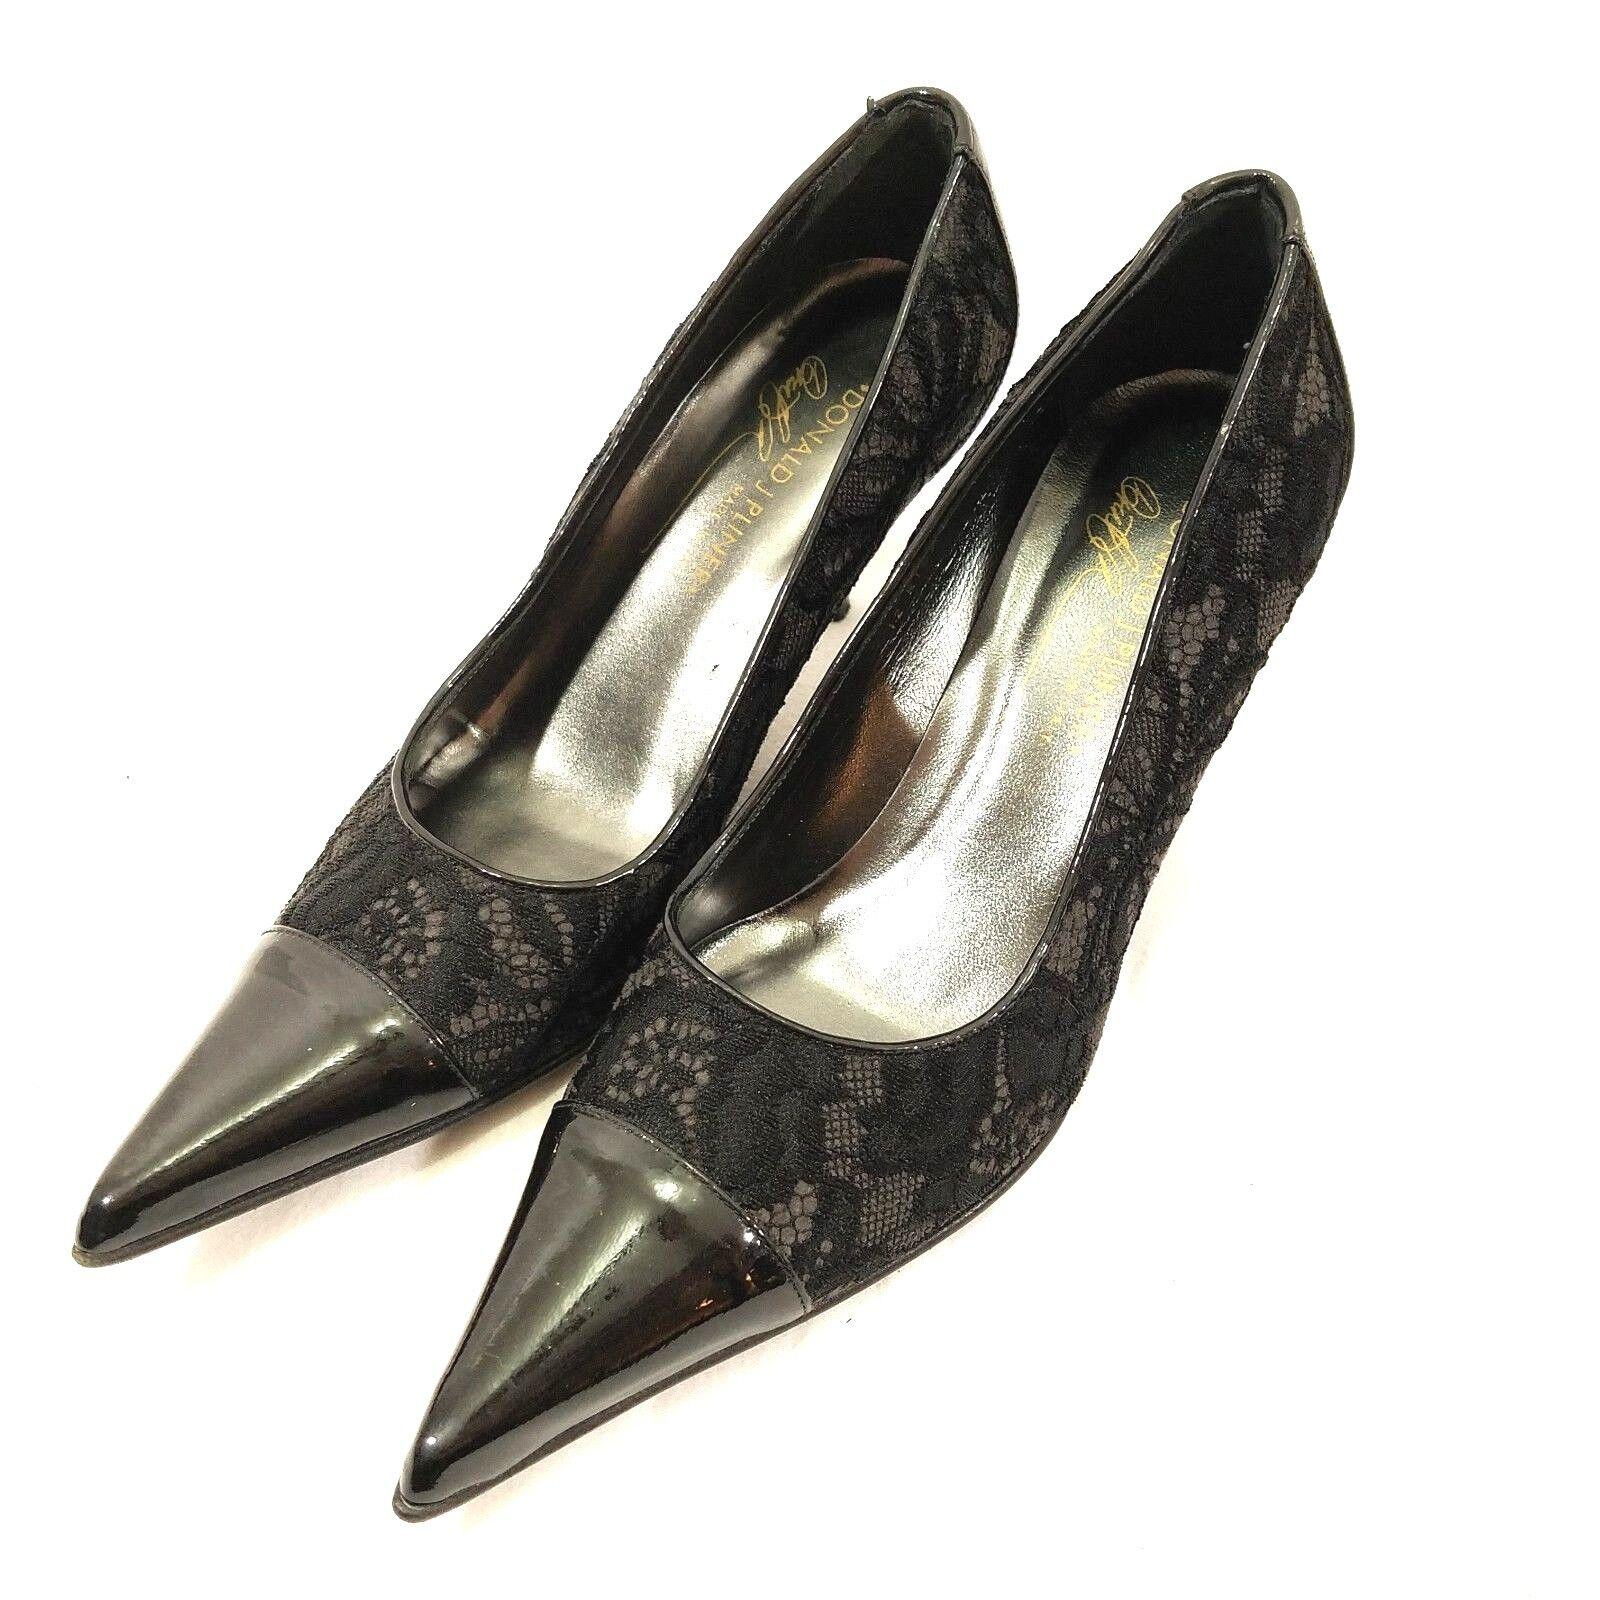 Donald J Pilner Pilner Pilner Womens Heels 6.5M Lace Design Shiny Toe 1b93c1